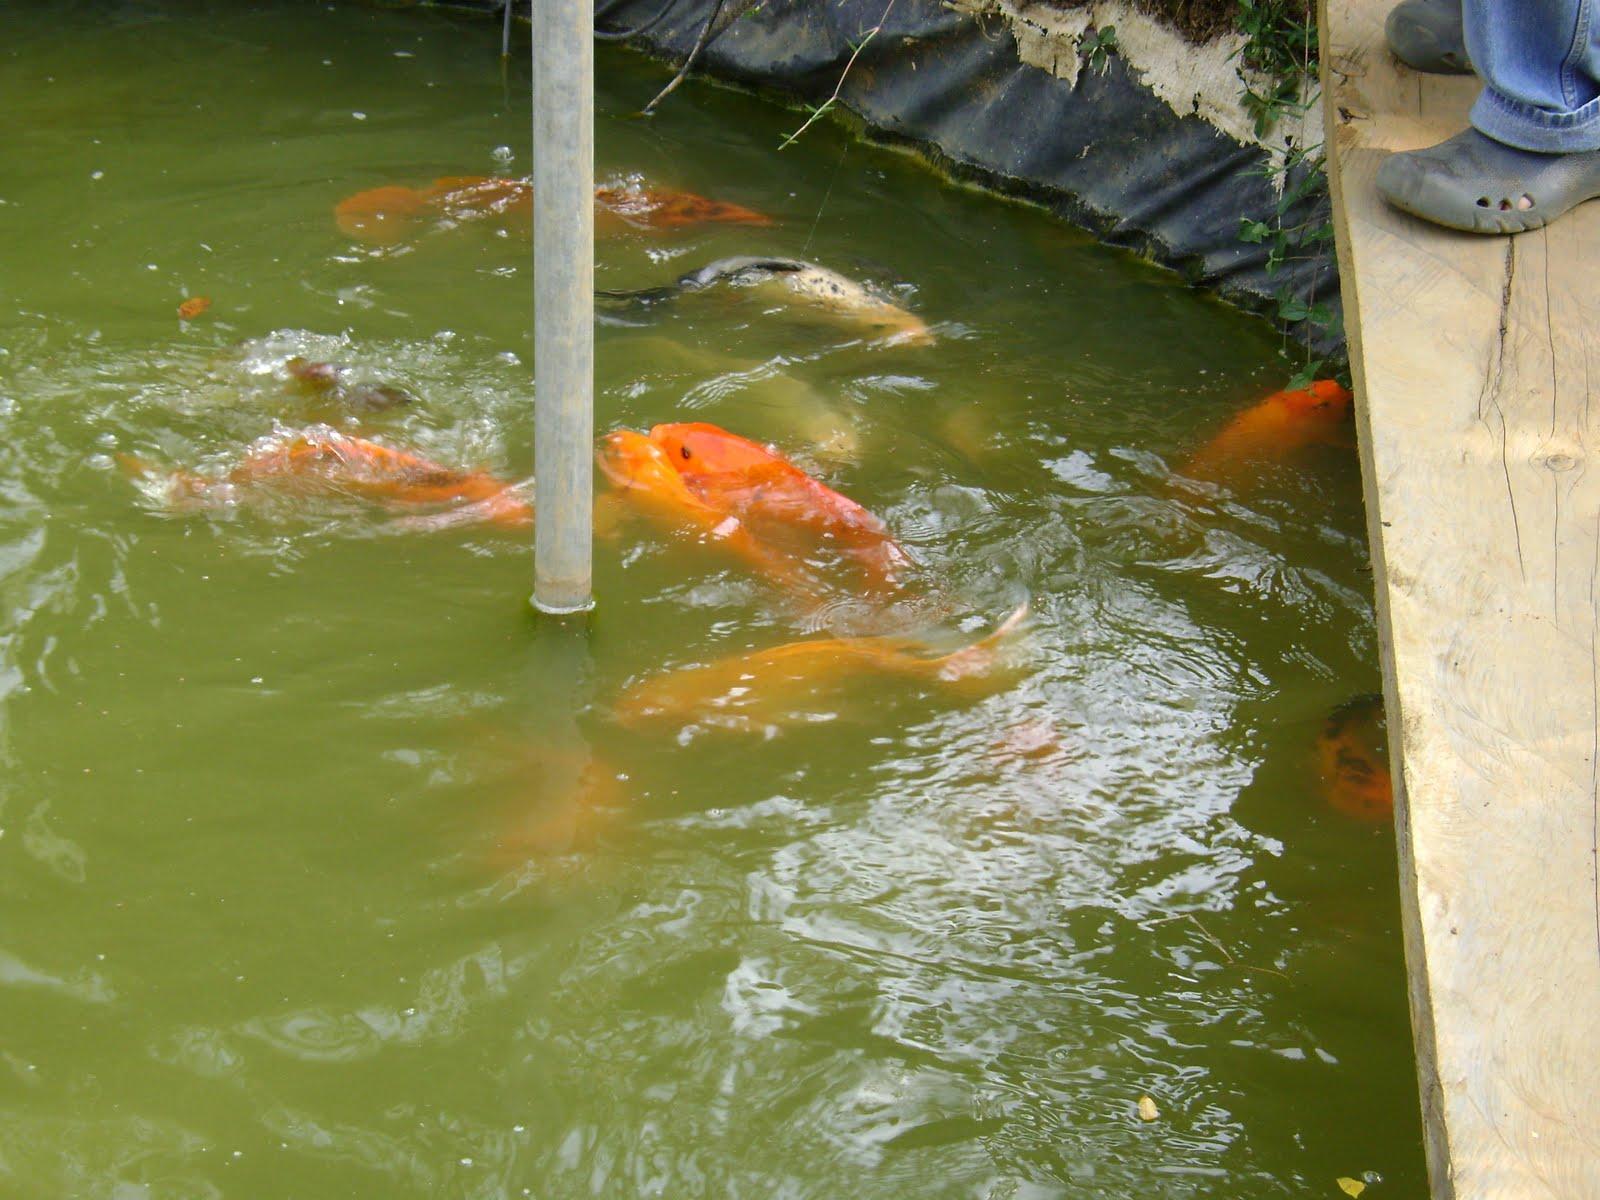 Peces ornamentales koi lagos koi for Cria de peces ornamentales